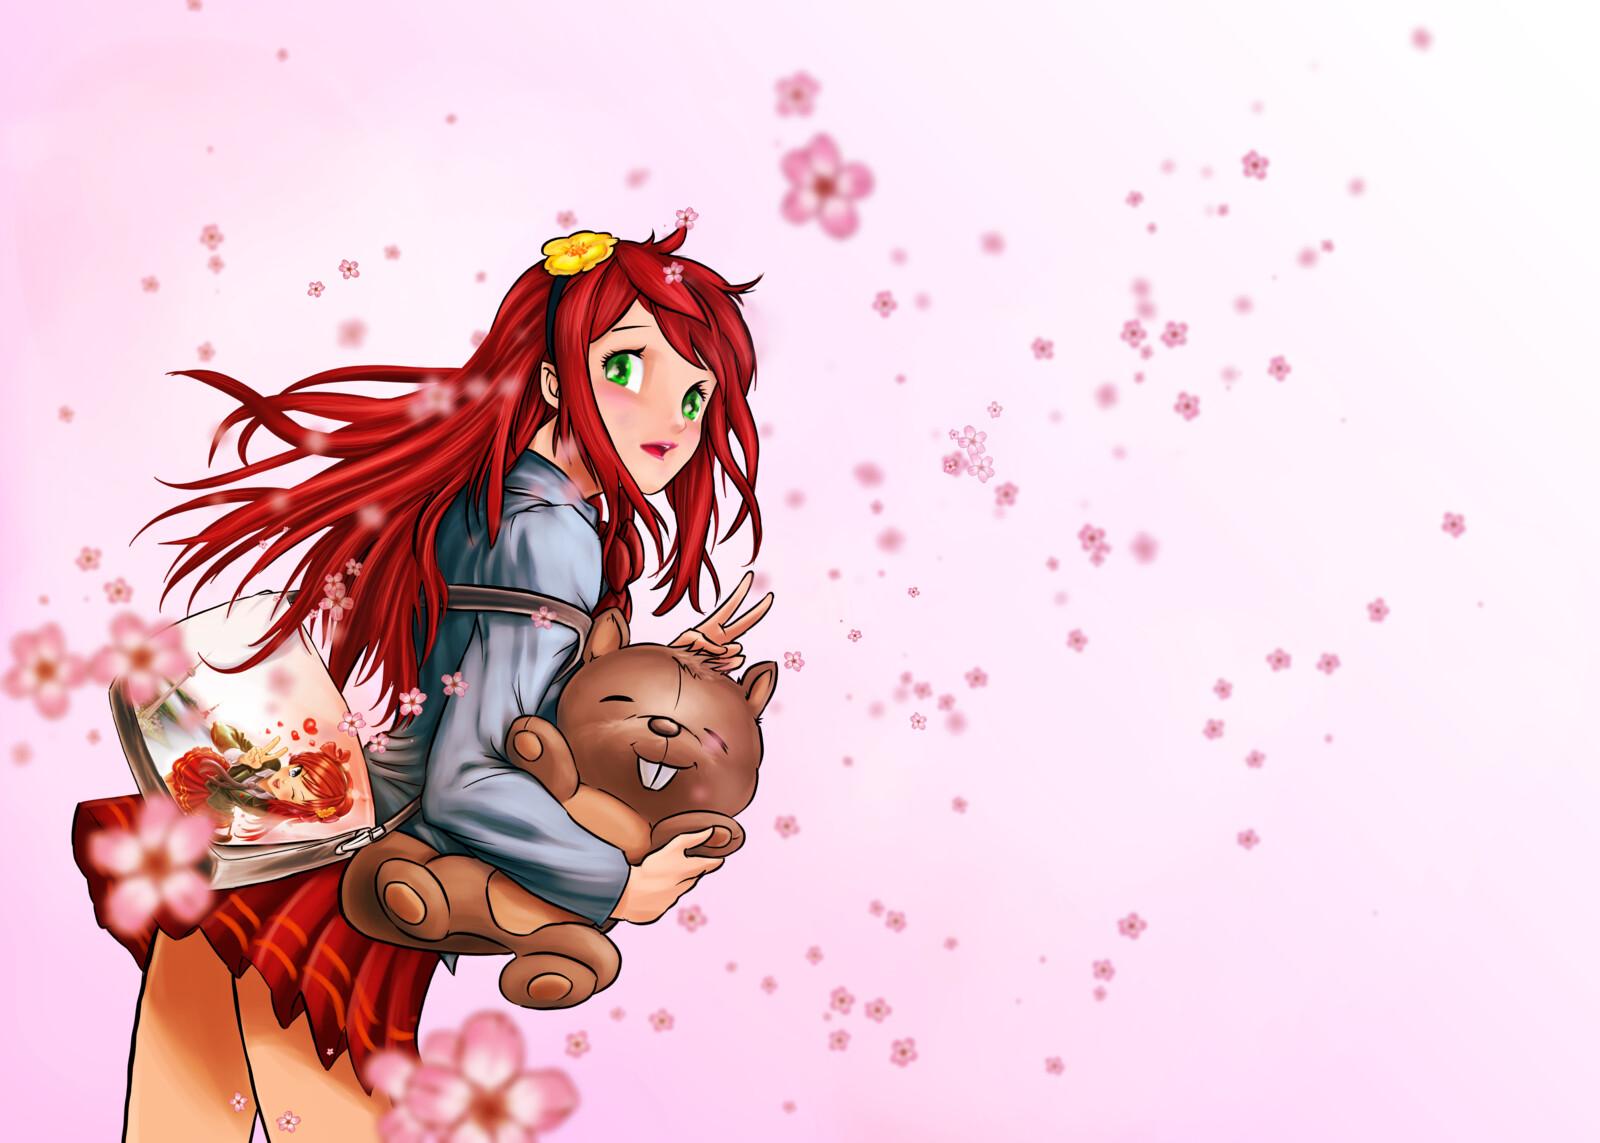 Office Anime North 2019 Merchandise Artwork